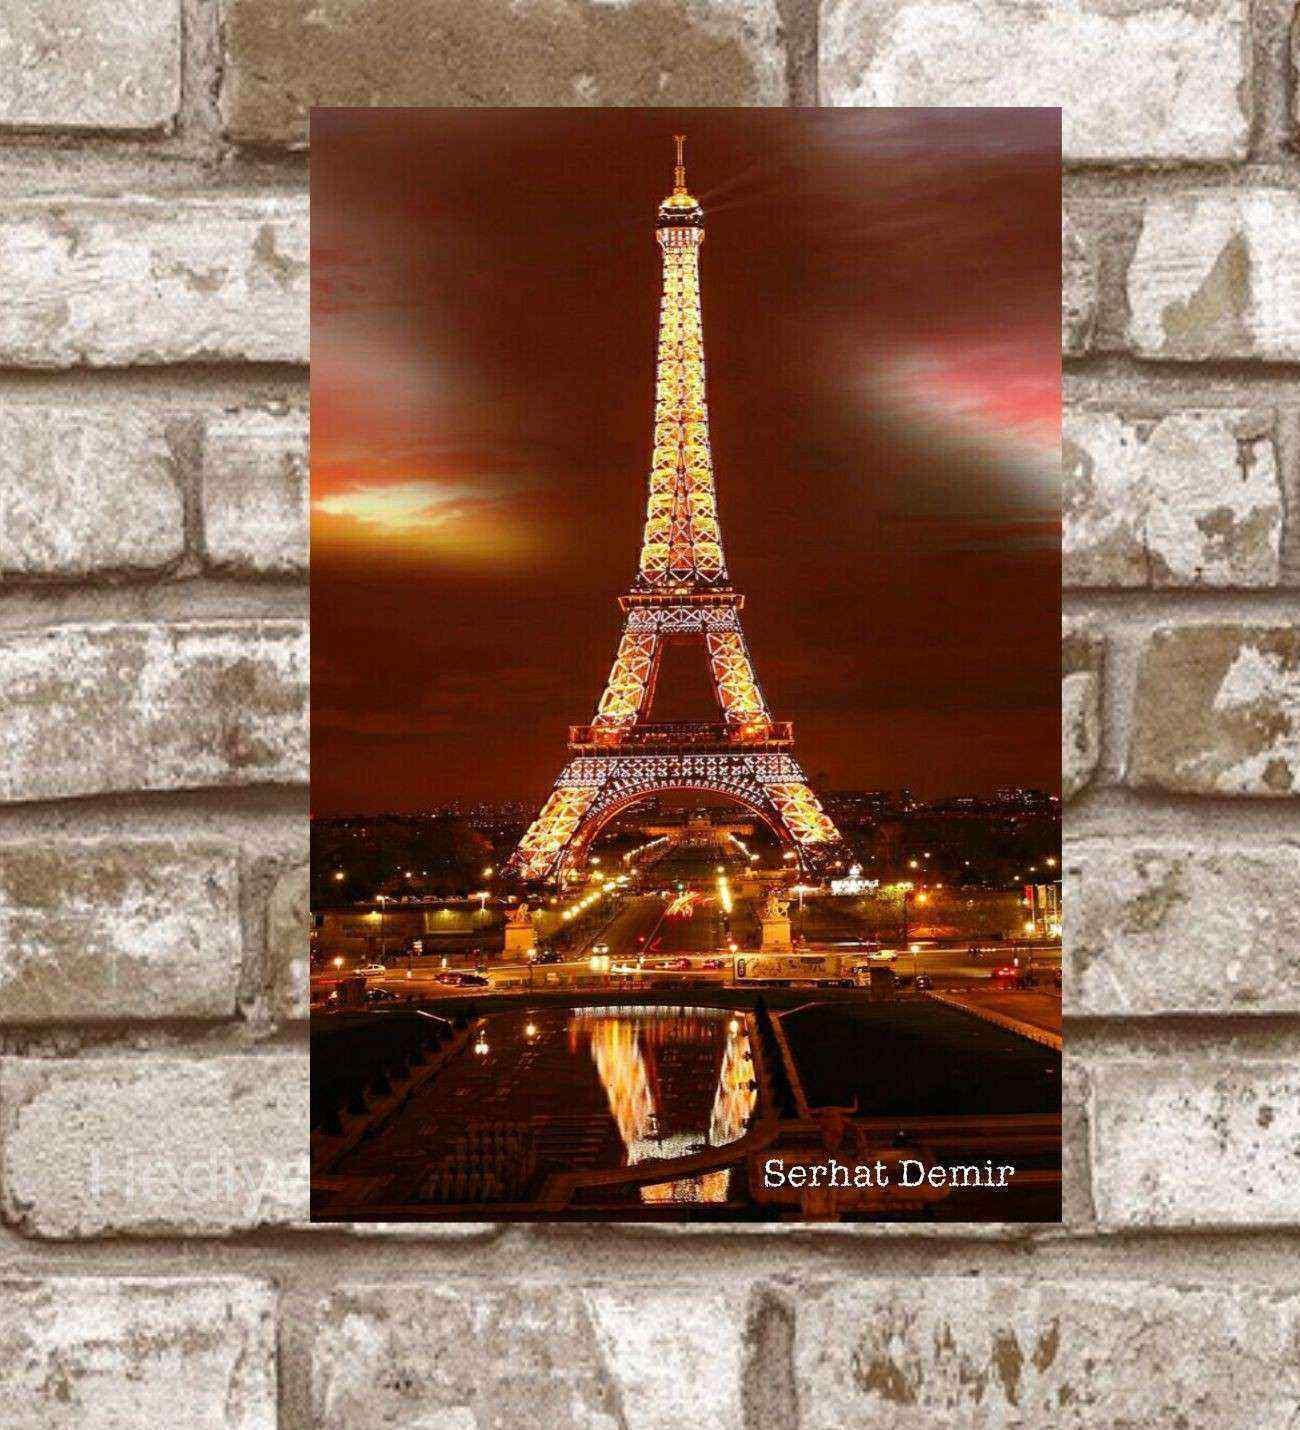 Kişiye Özel Metal Paris 2 Retro Poster (29x19)